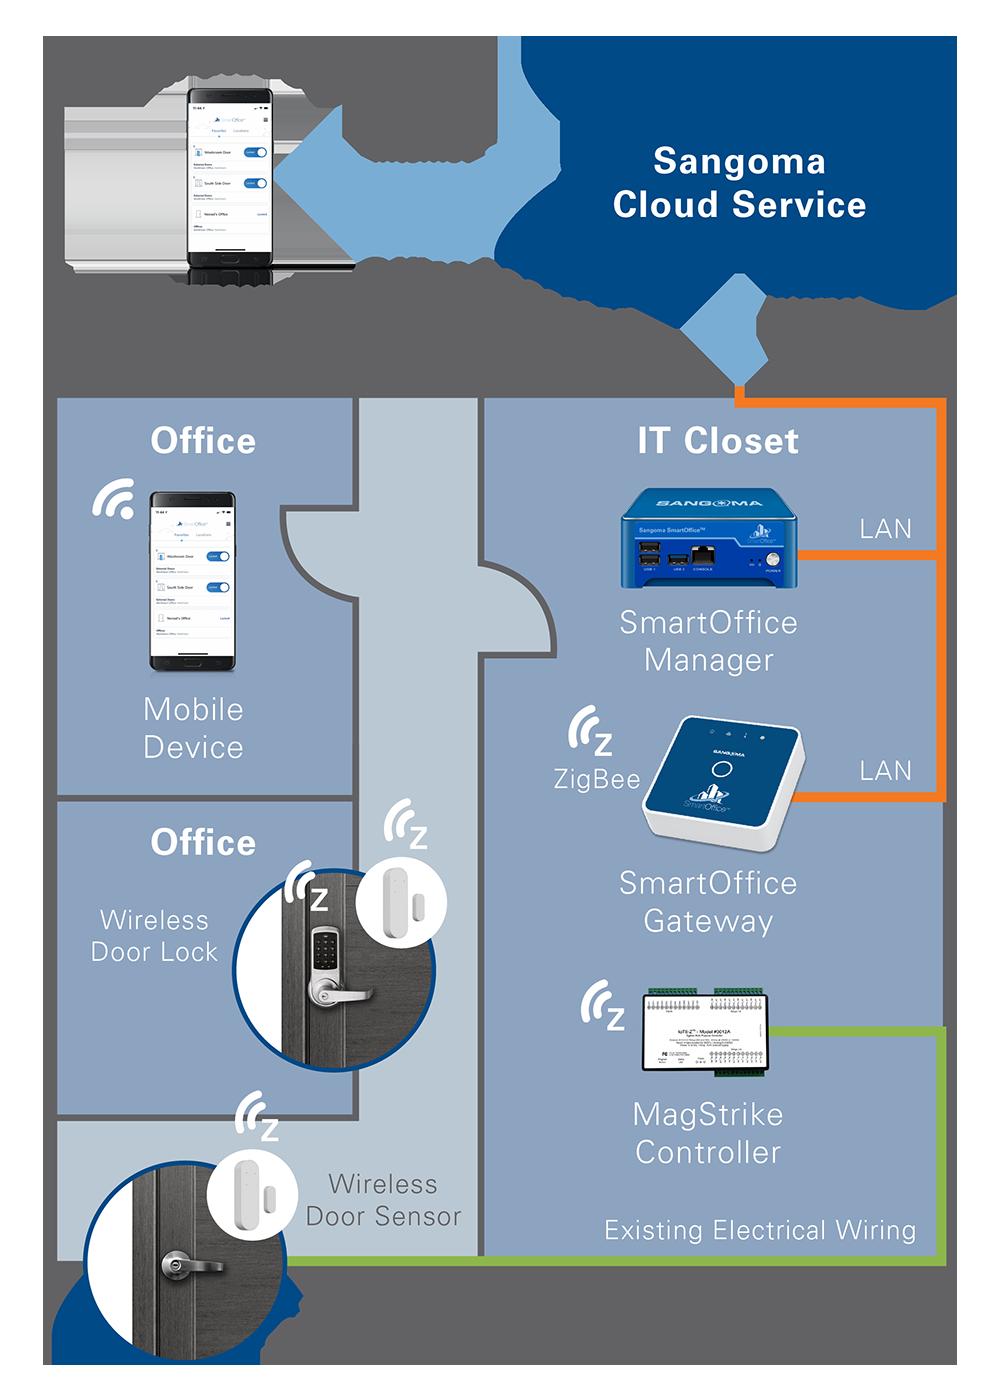 Diagram of the SmartOffice Access Environment